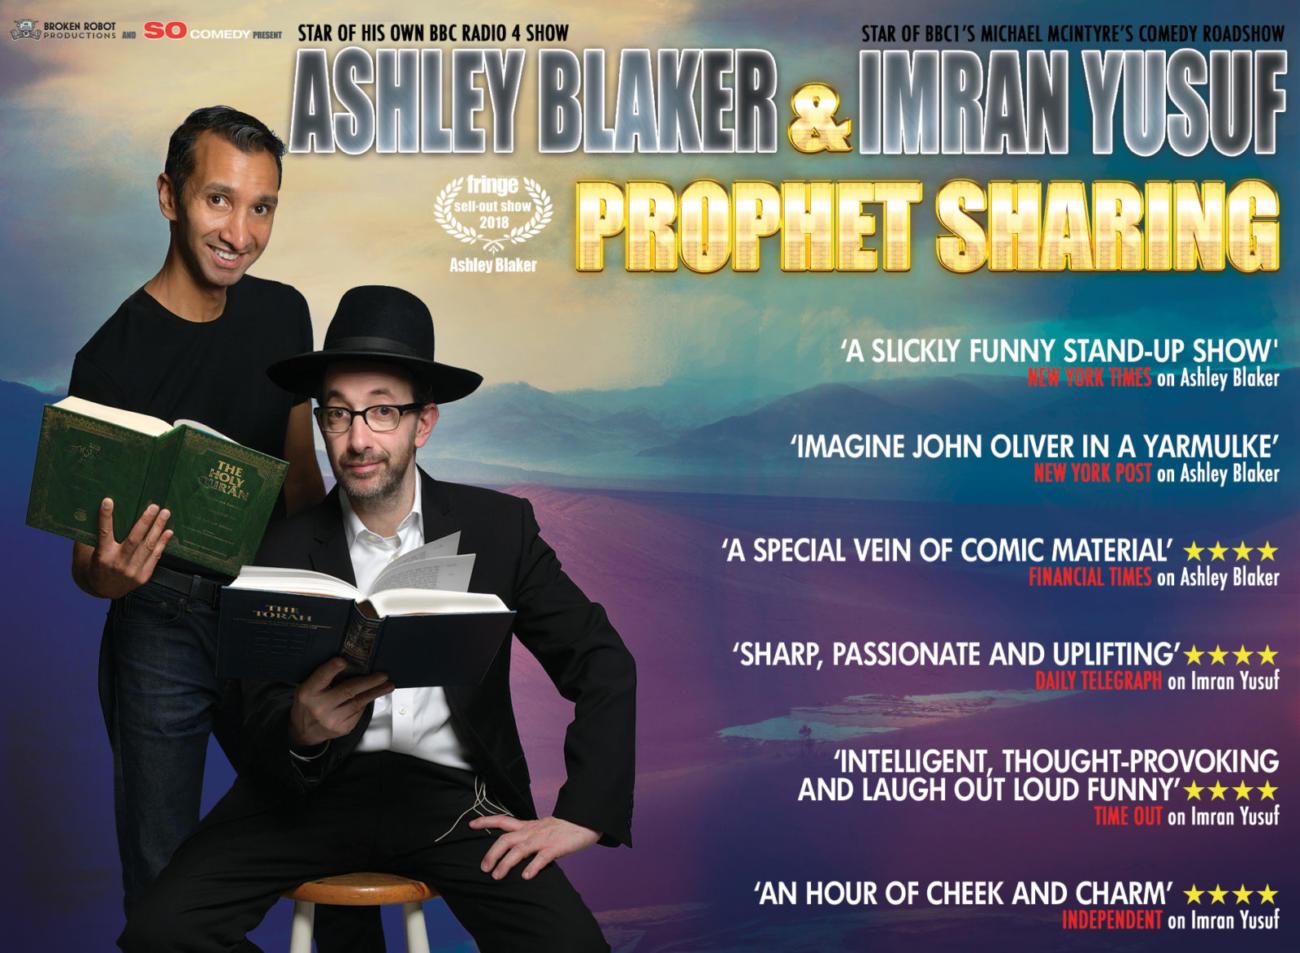 Prophet-Sharing